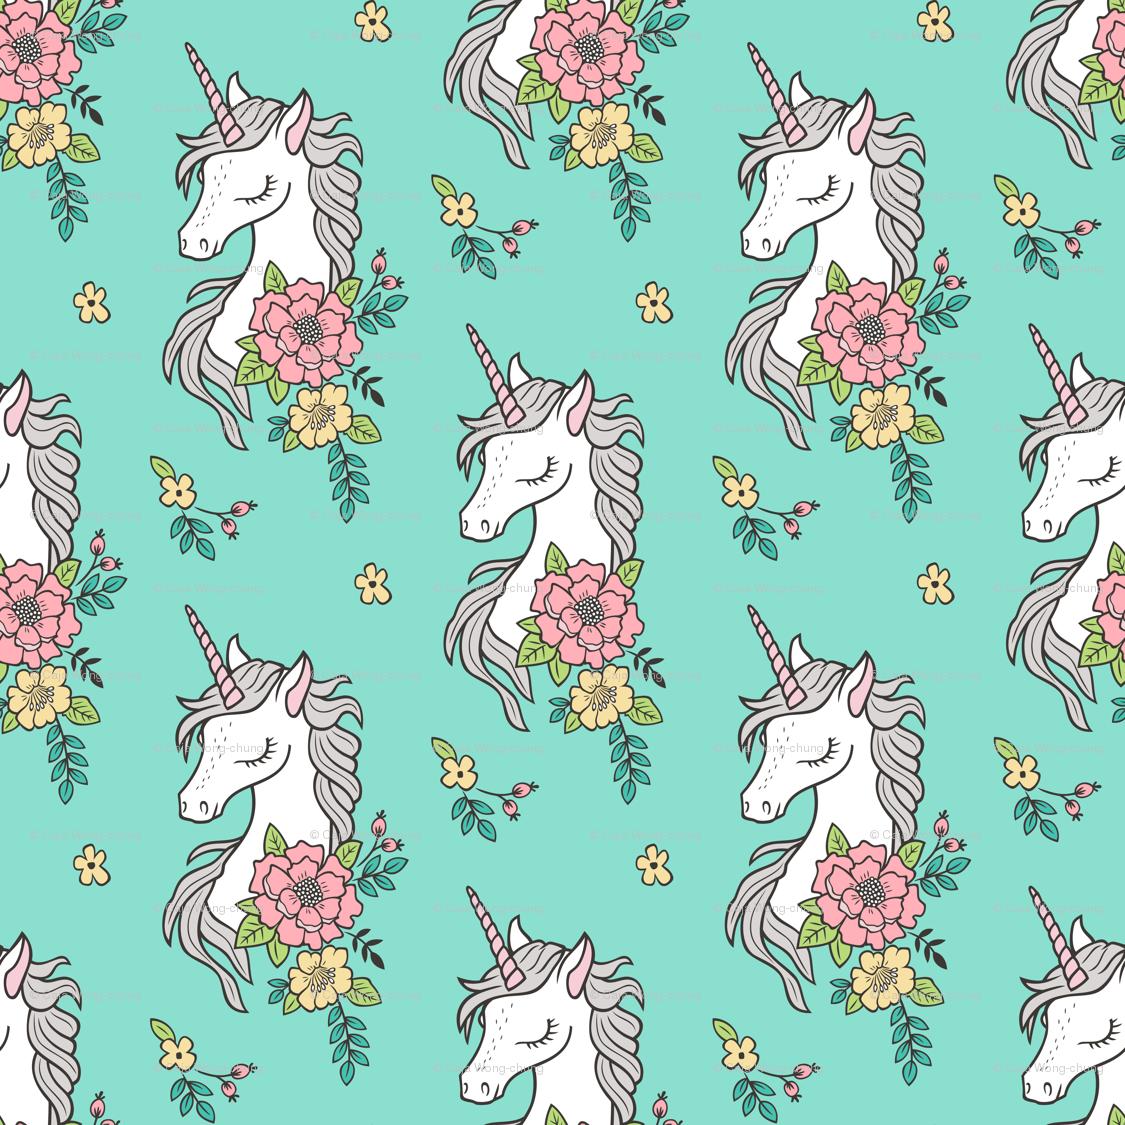 dreamy unicorn vintage boho flowers on mint green fabric